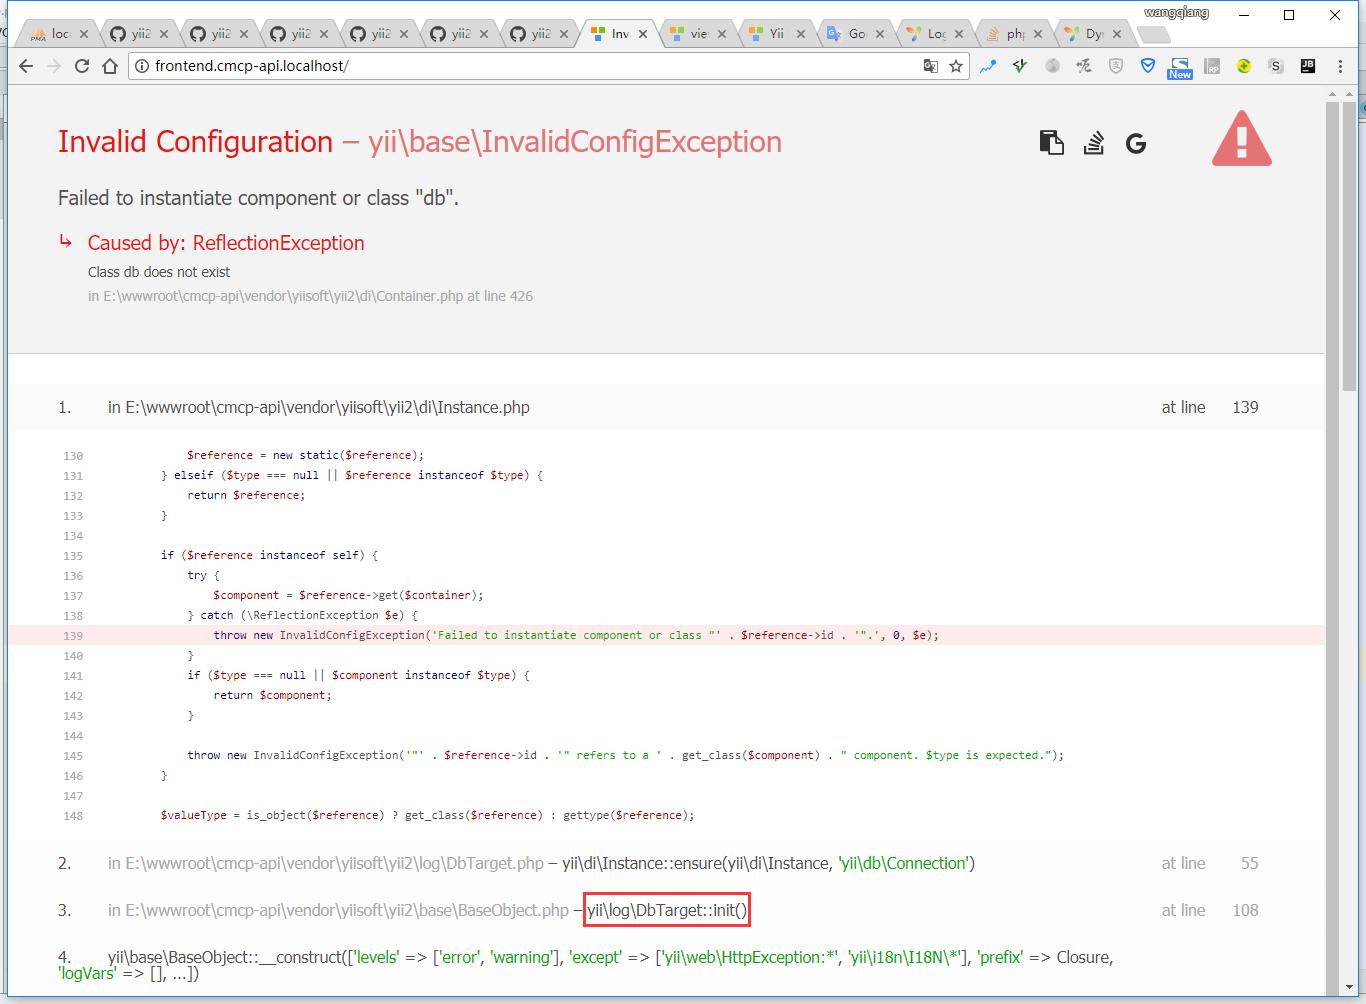 "打开:http://frontend.cmcp-api.localhost/ ,报错:Failed to instantiate component or class ""db"".,原因在于日志目标为数据库表"